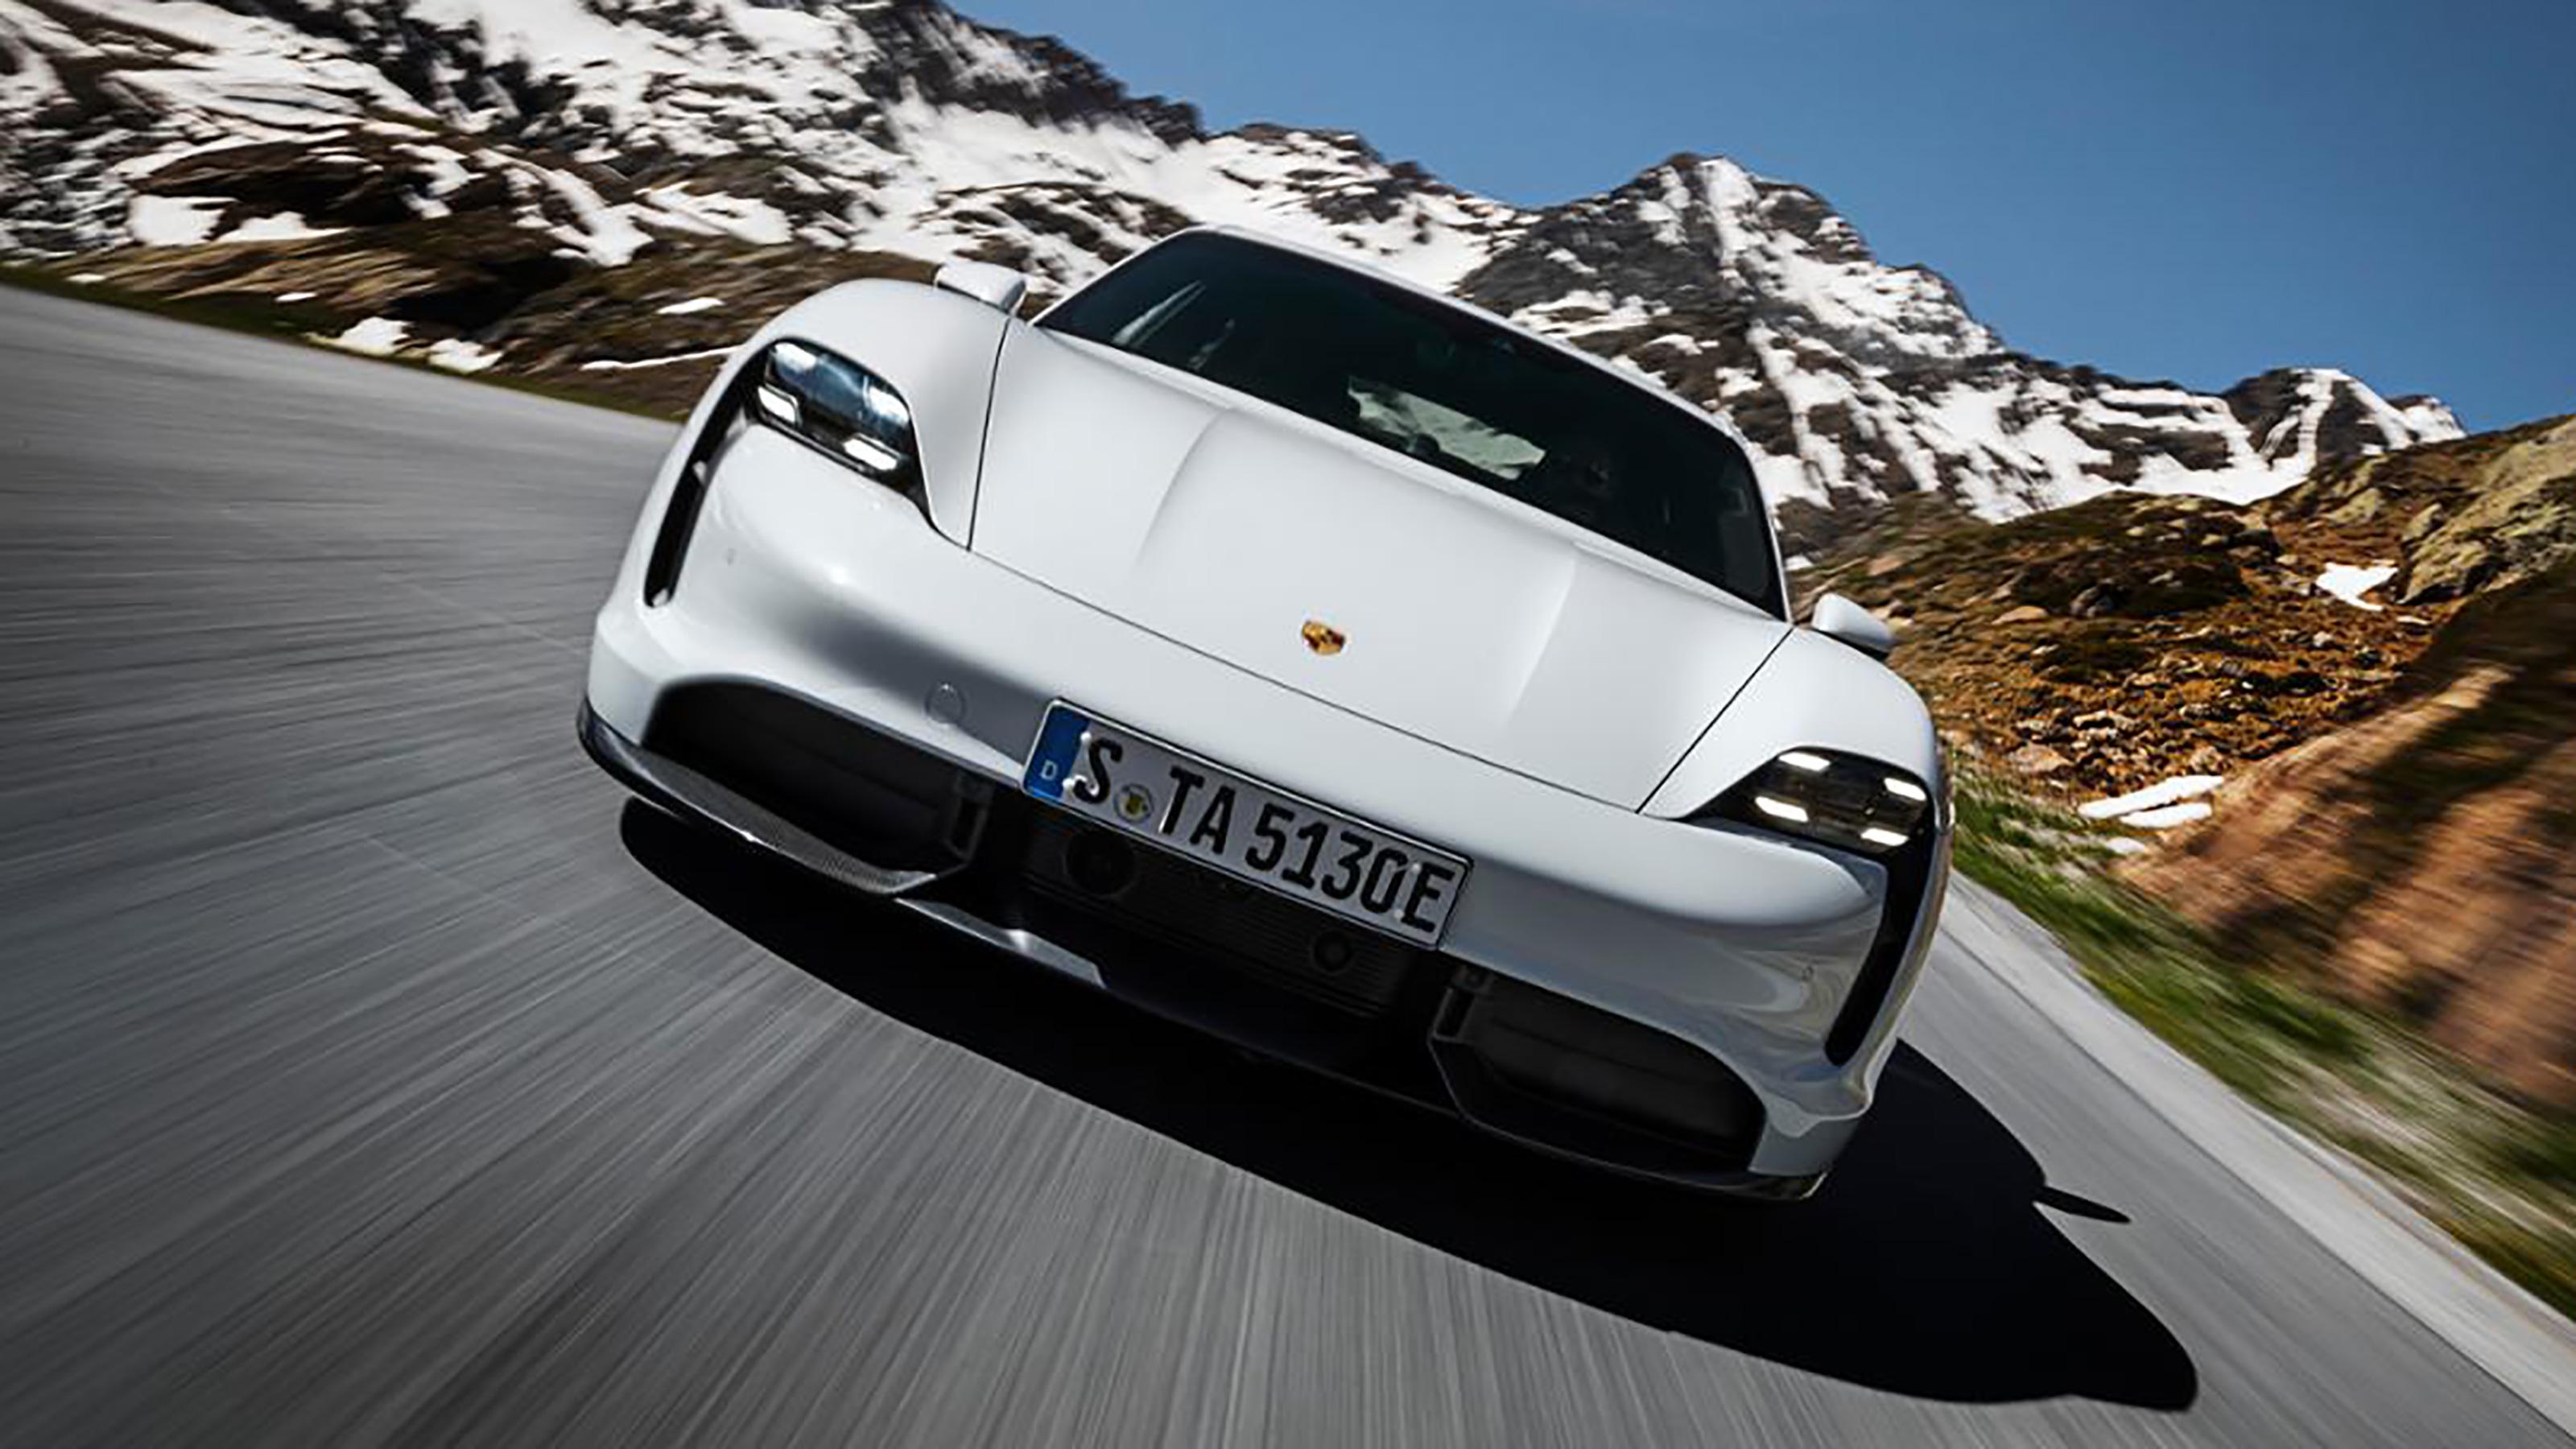 Porsche Taycan Gets Even Quicker Following Software Upgrade Auto Express